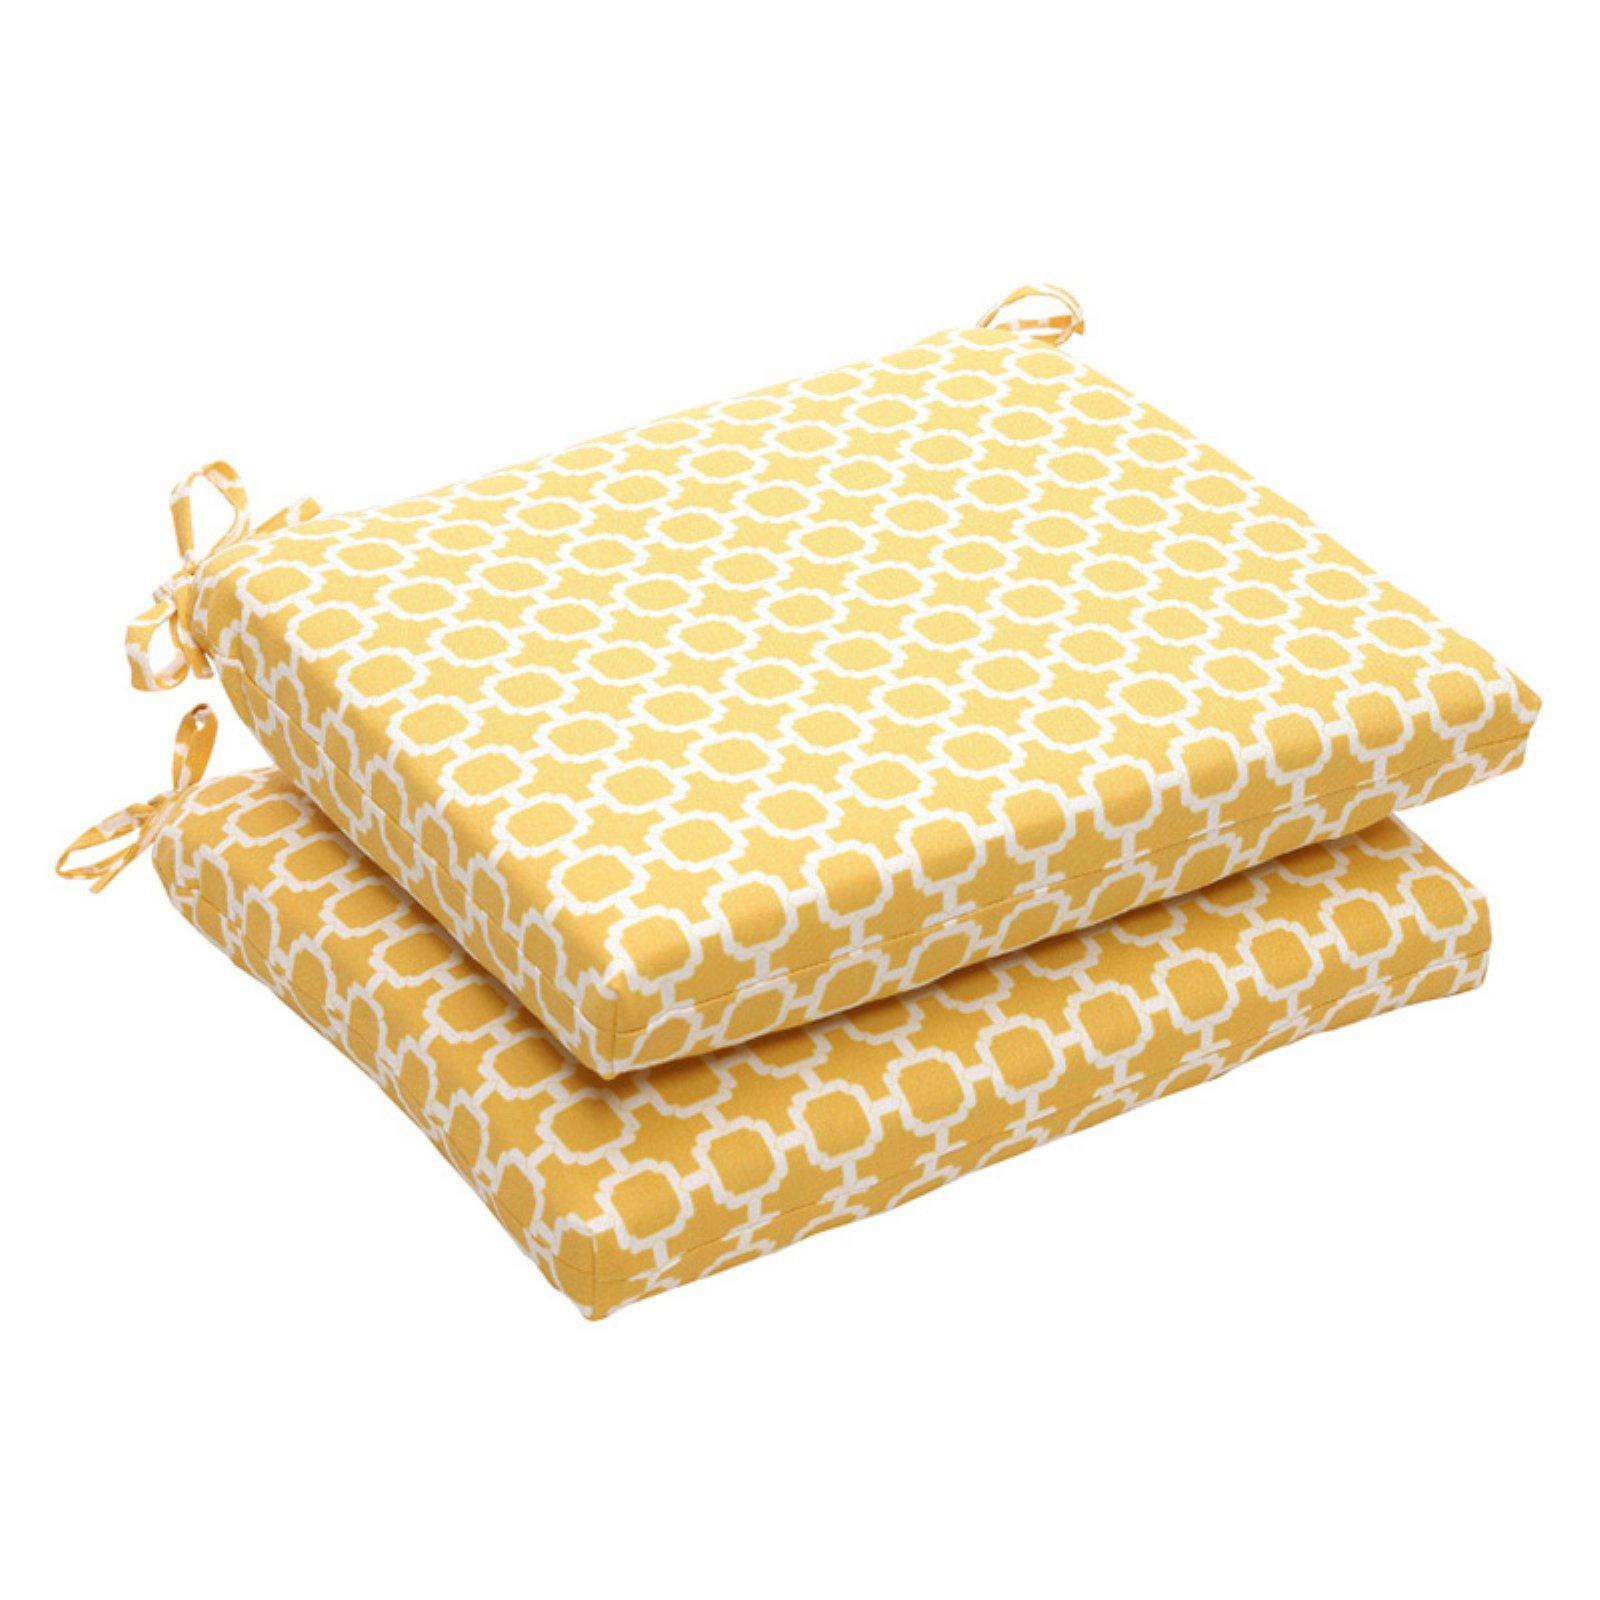 Pillow Perfect Geometric Print Outdoor Seat Cushion - 18.5 x 16 x 3 in. -